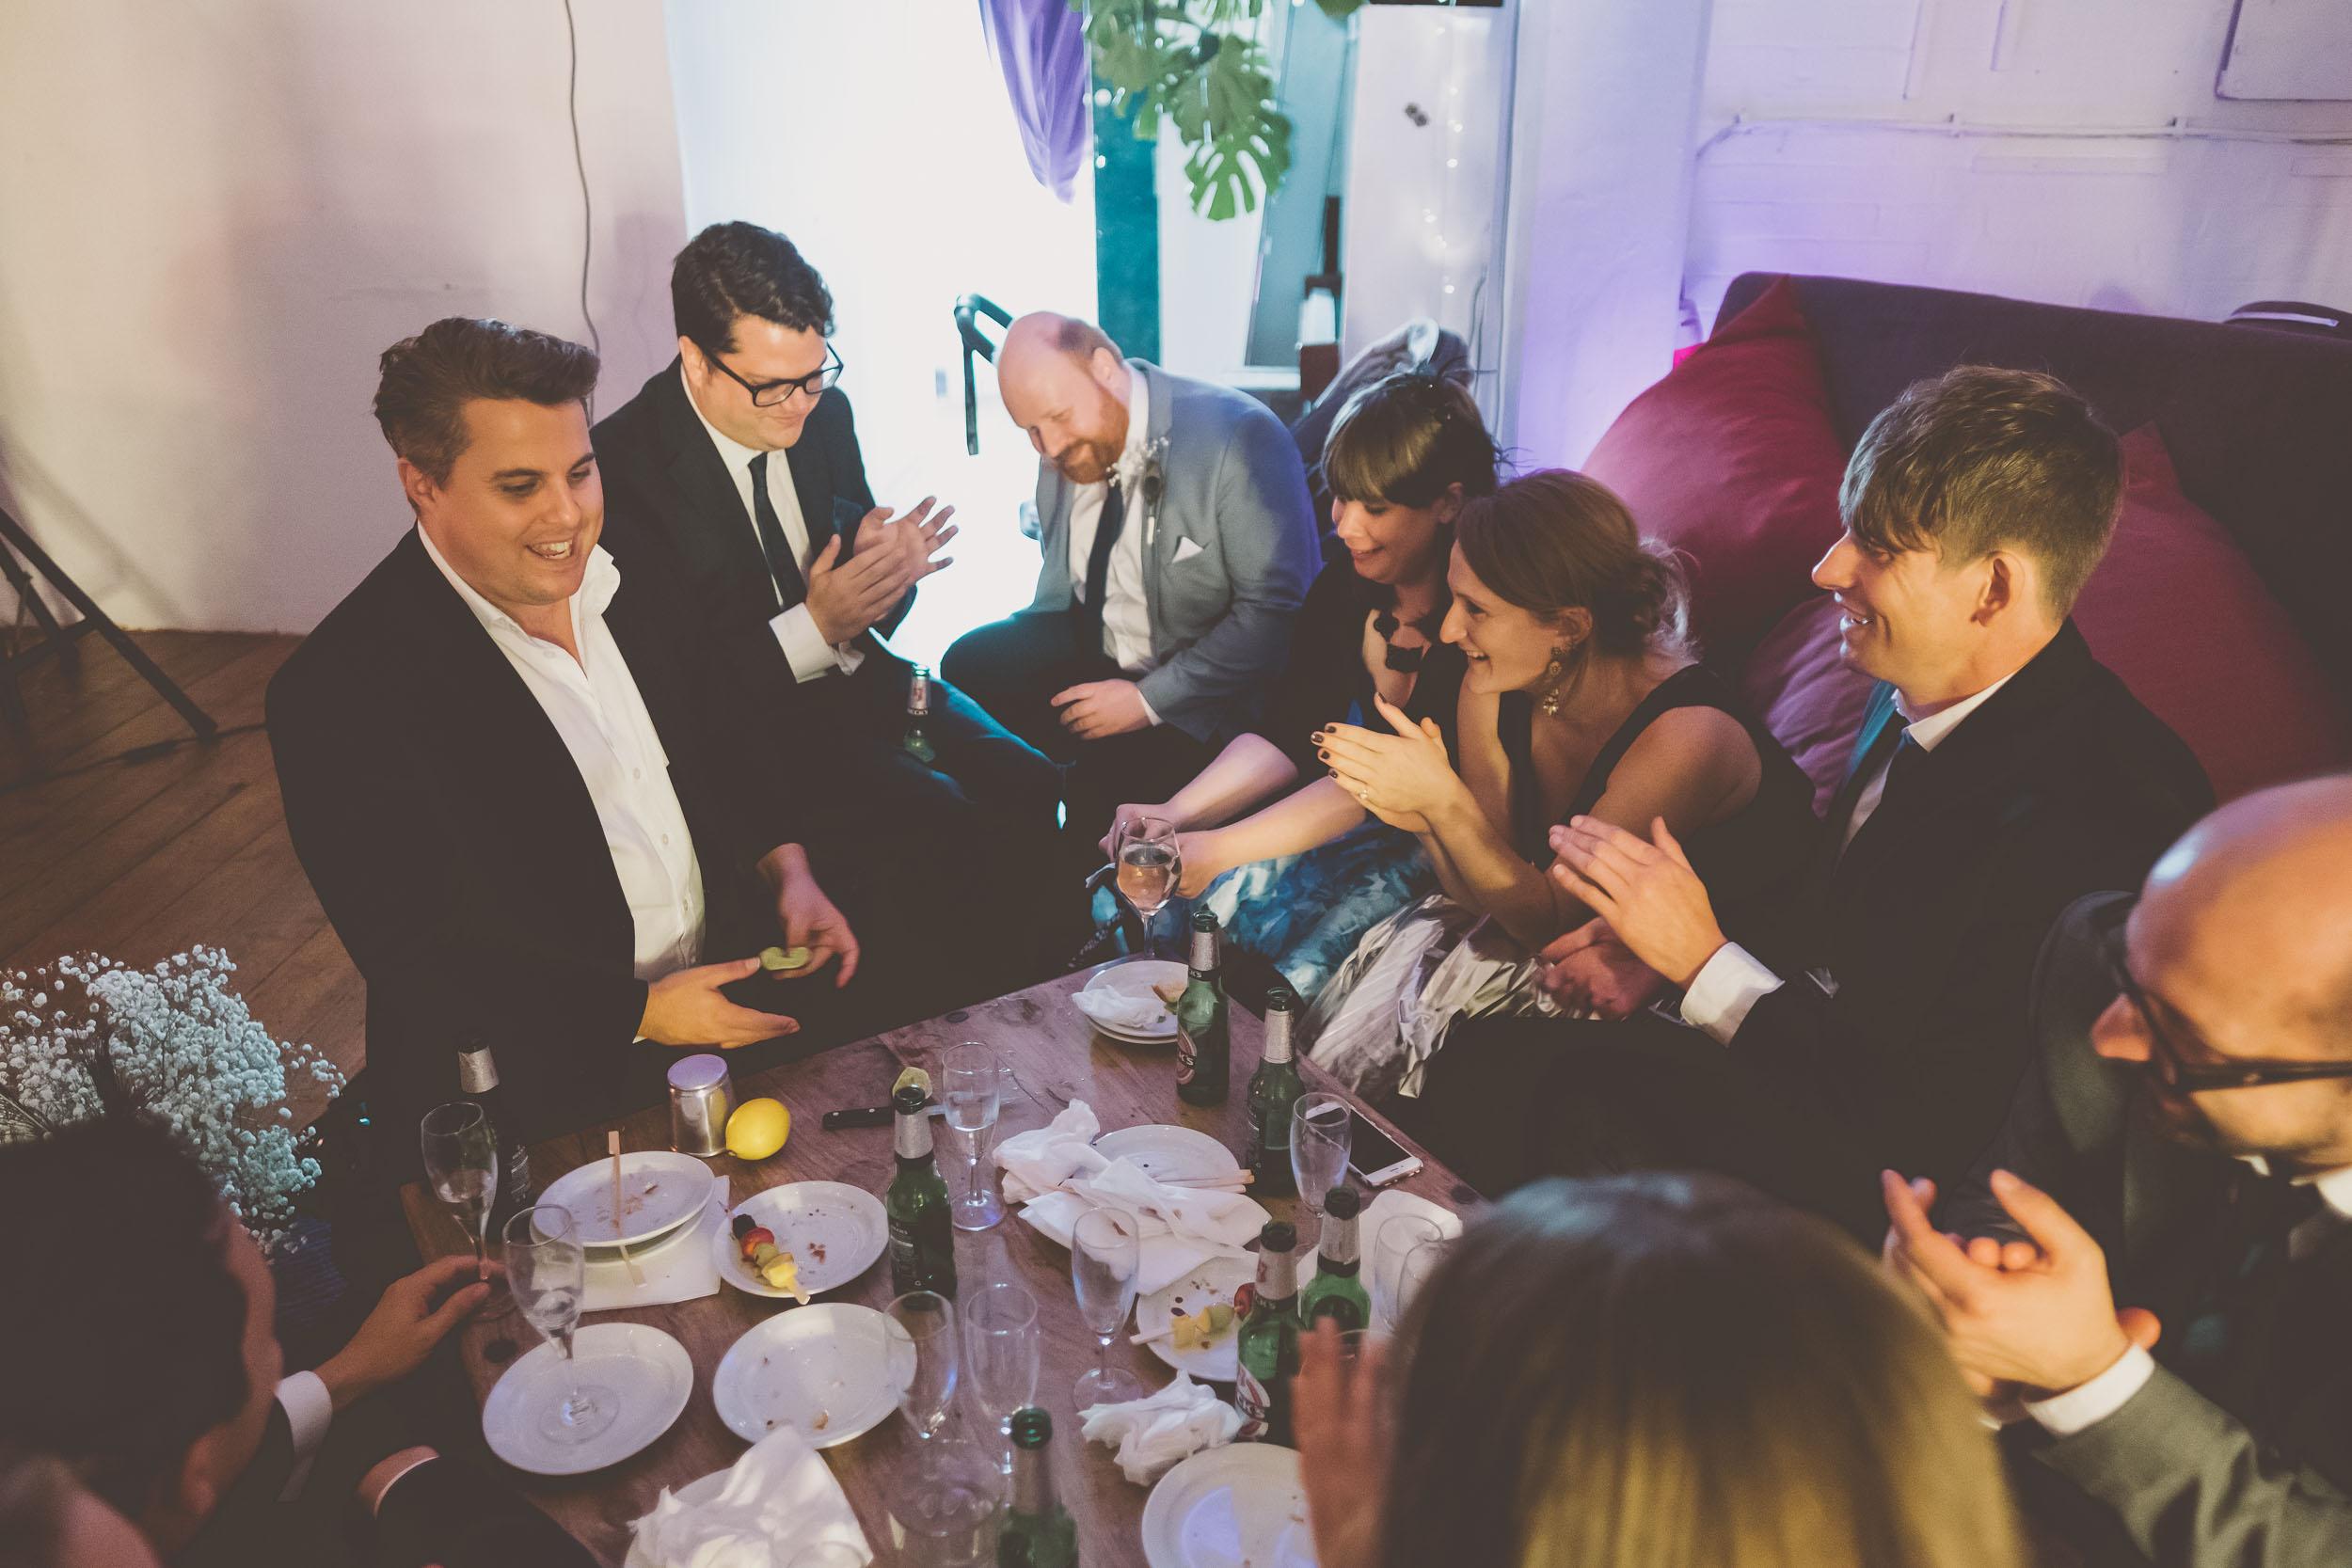 islington-town-hall-4th-floor-studios-wedding318.jpg